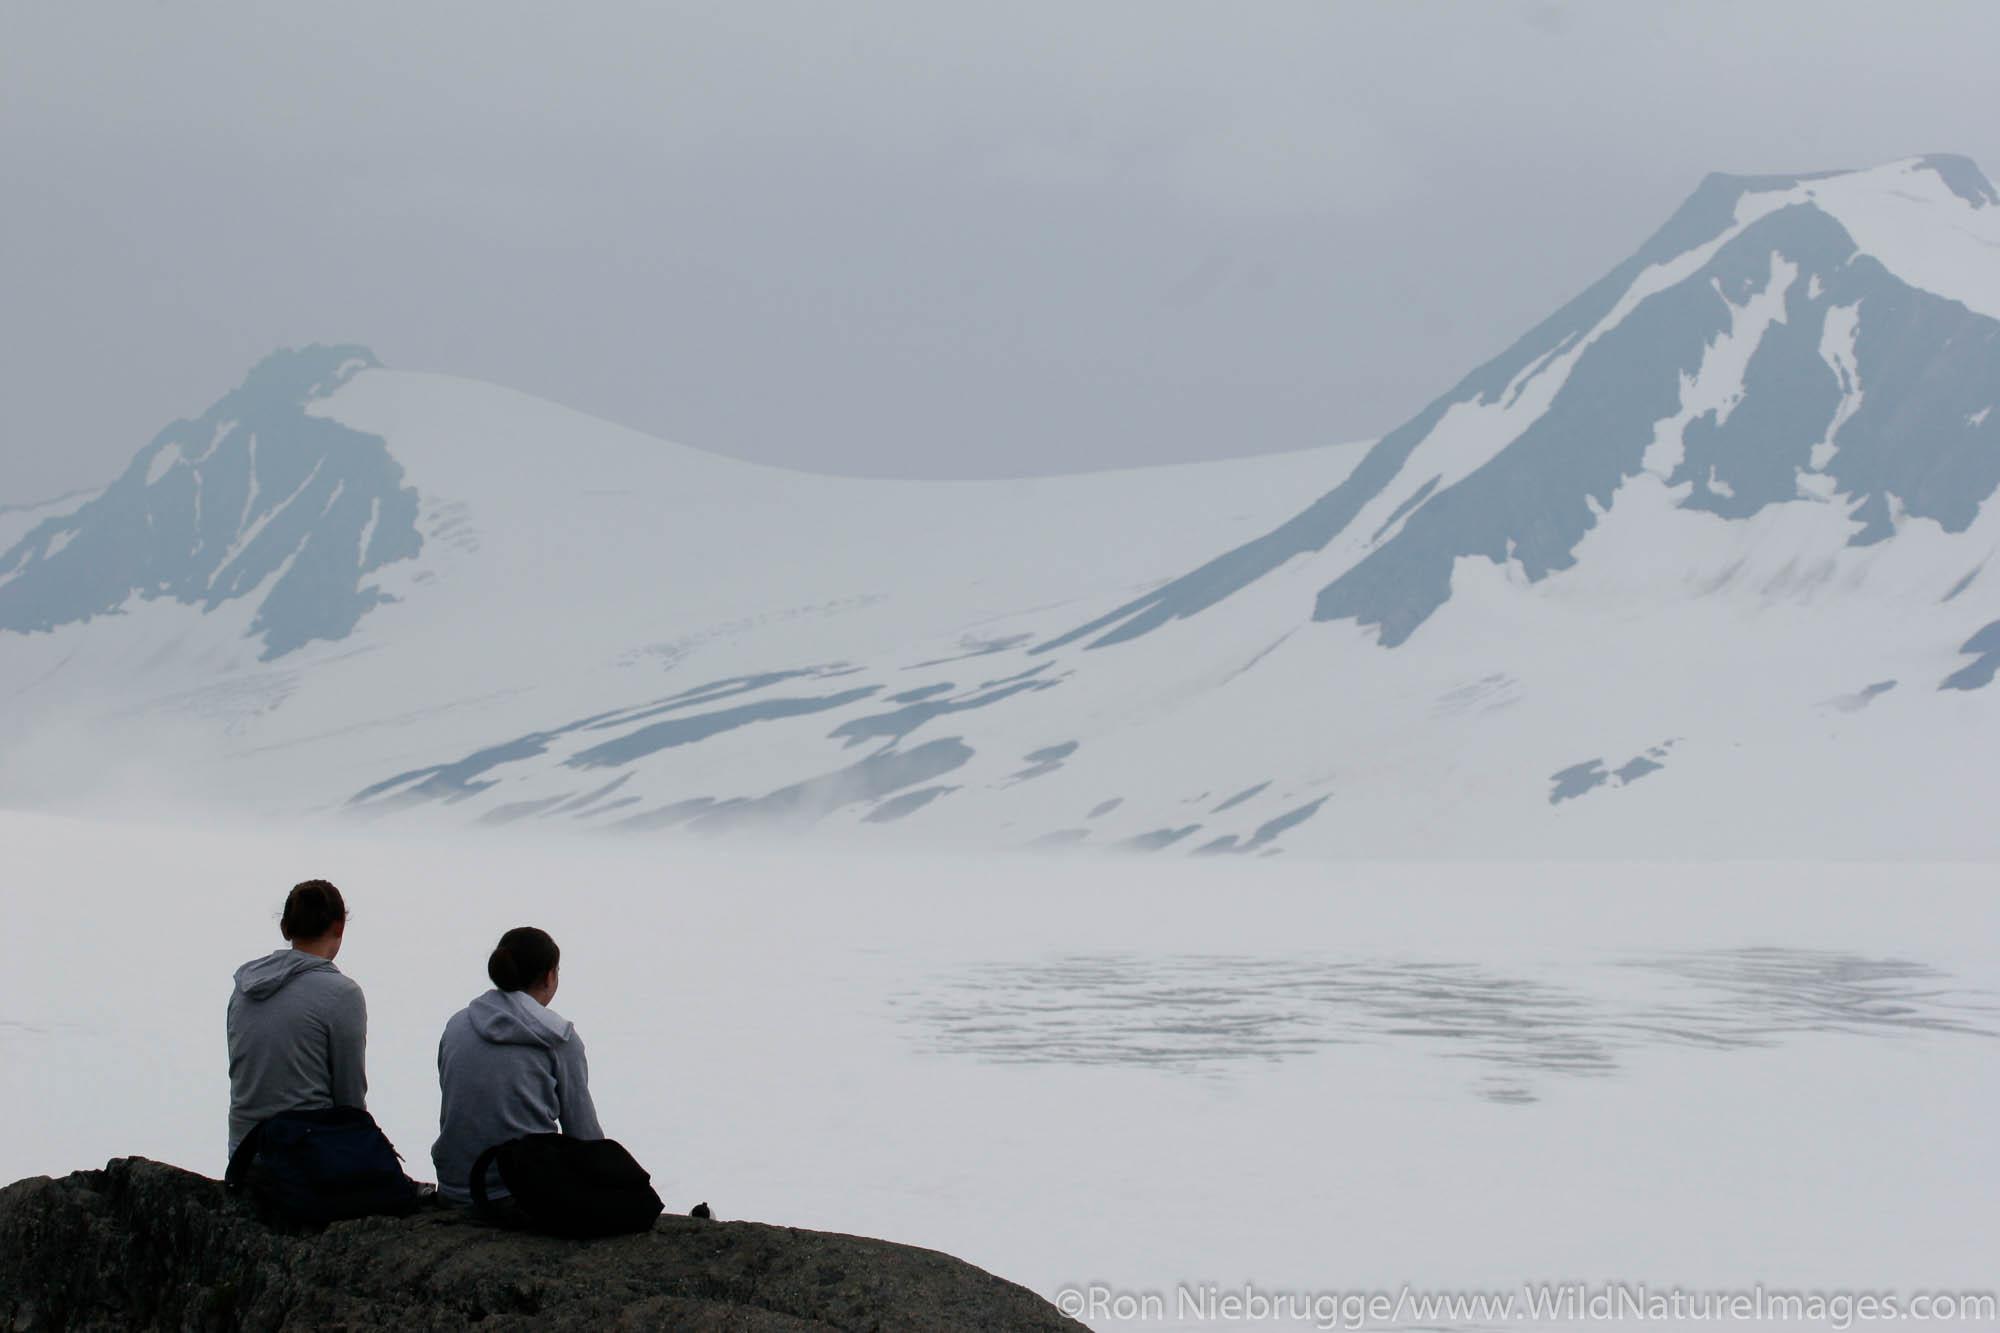 Hikers enjoying the view of the Harding Icefield, Kenai Fjords National Park, Alaska.